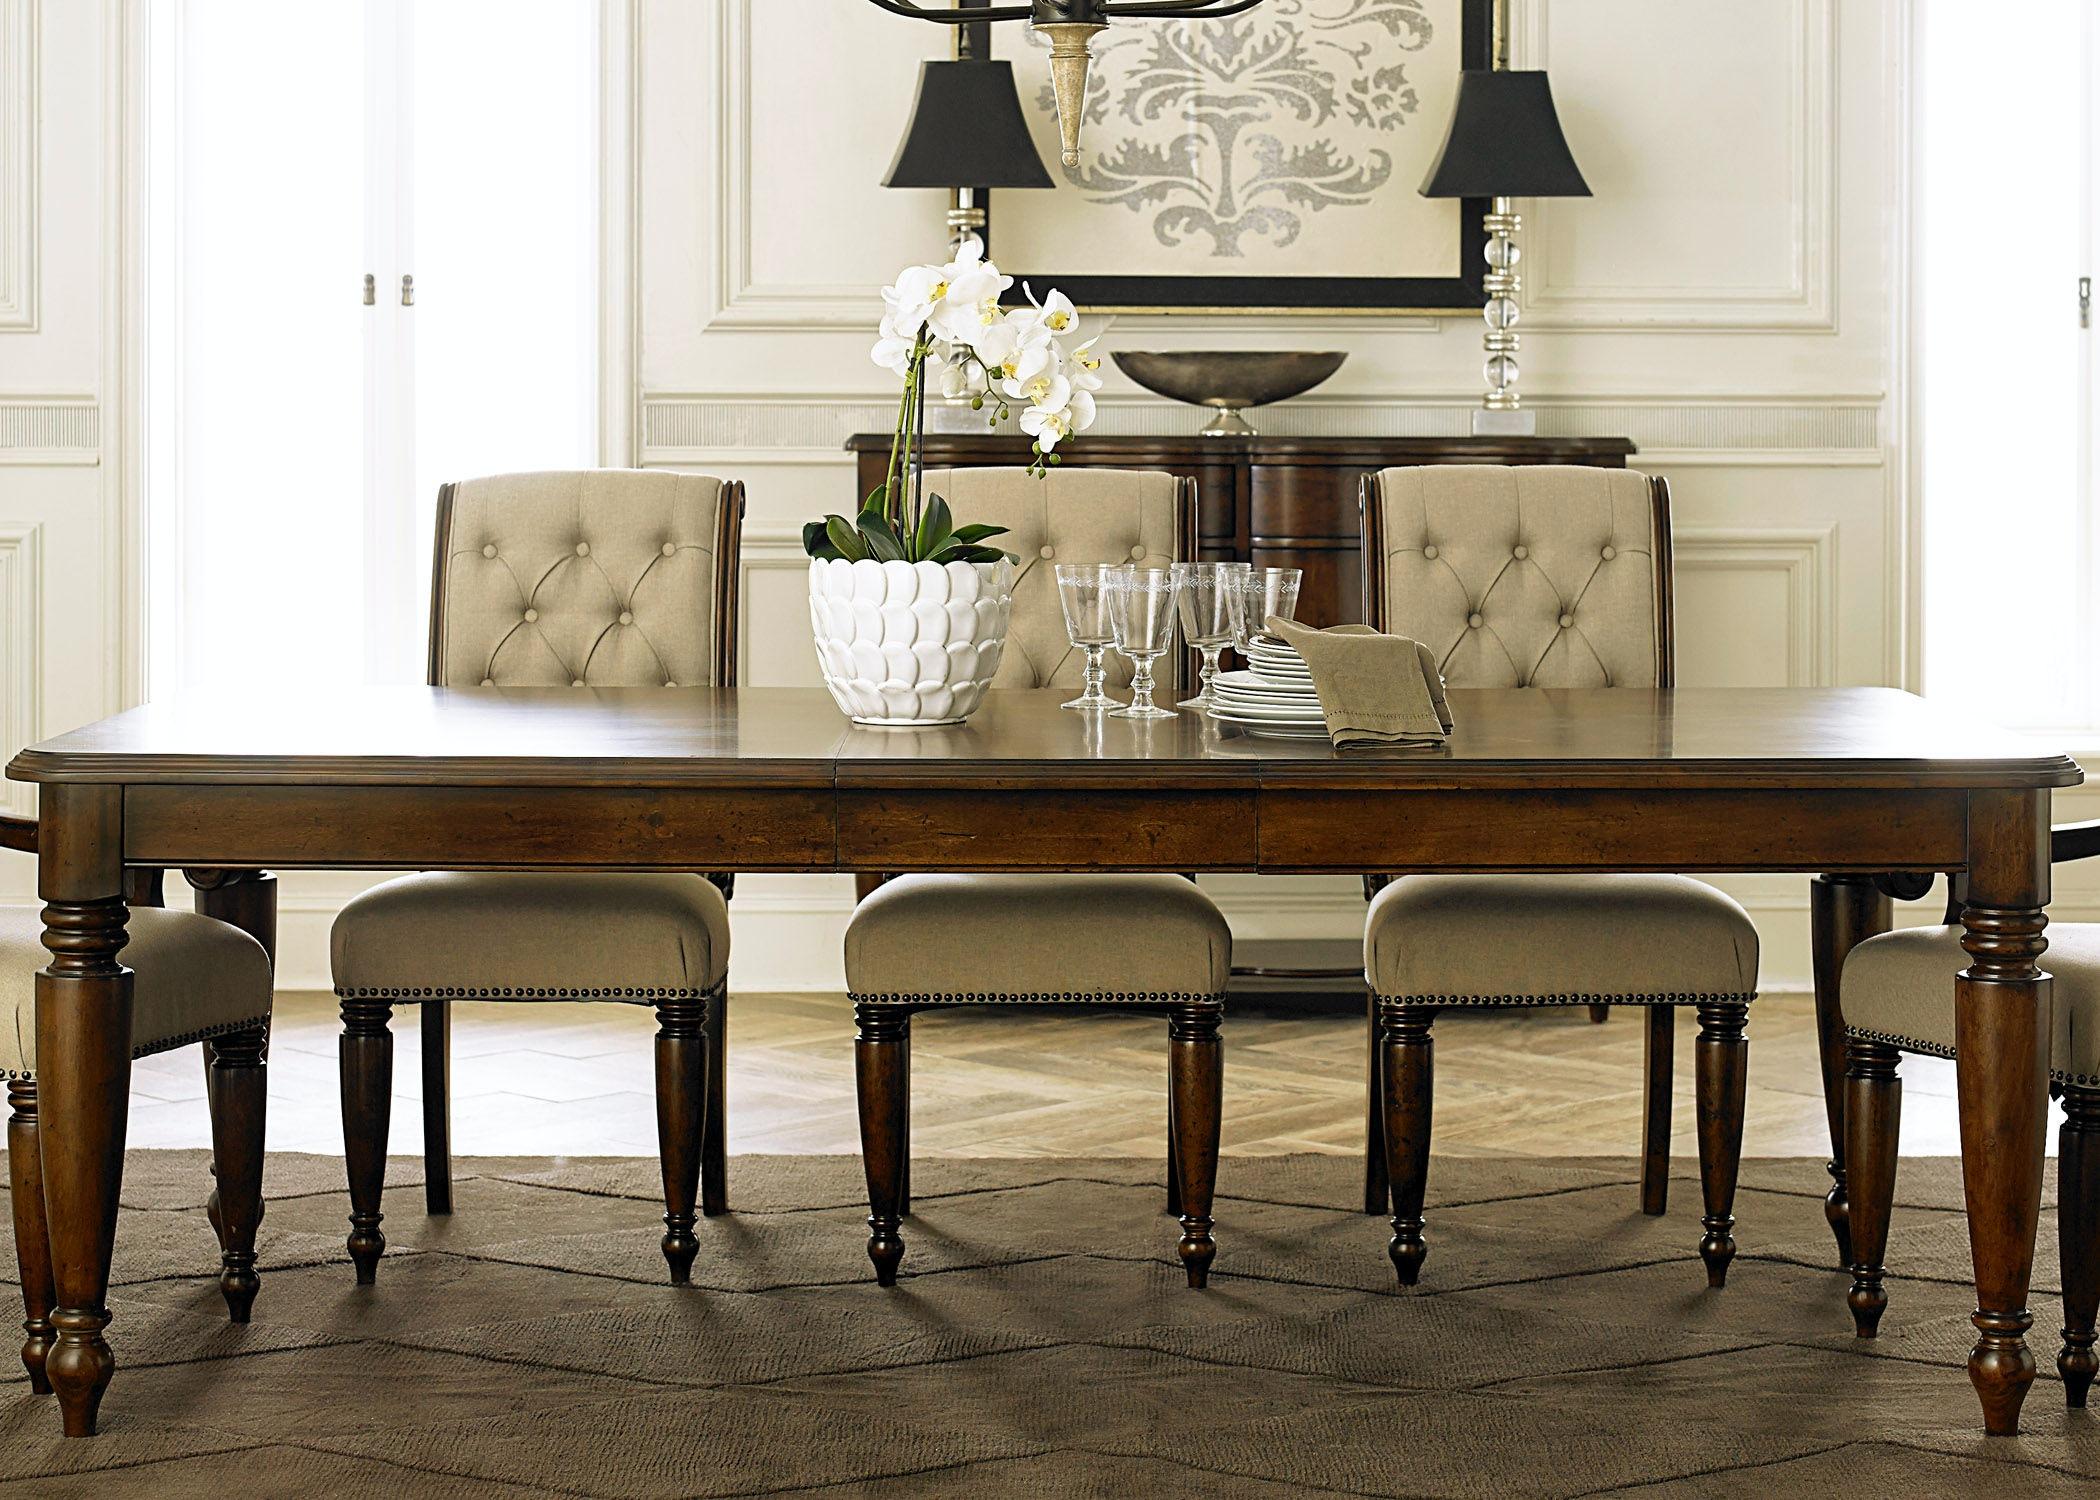 Amazing Liberty Furniture Dining Room Rectangular Leg Table 545 T4290   China Towne  Furniture   Solvay, NY | Syracuse, NY